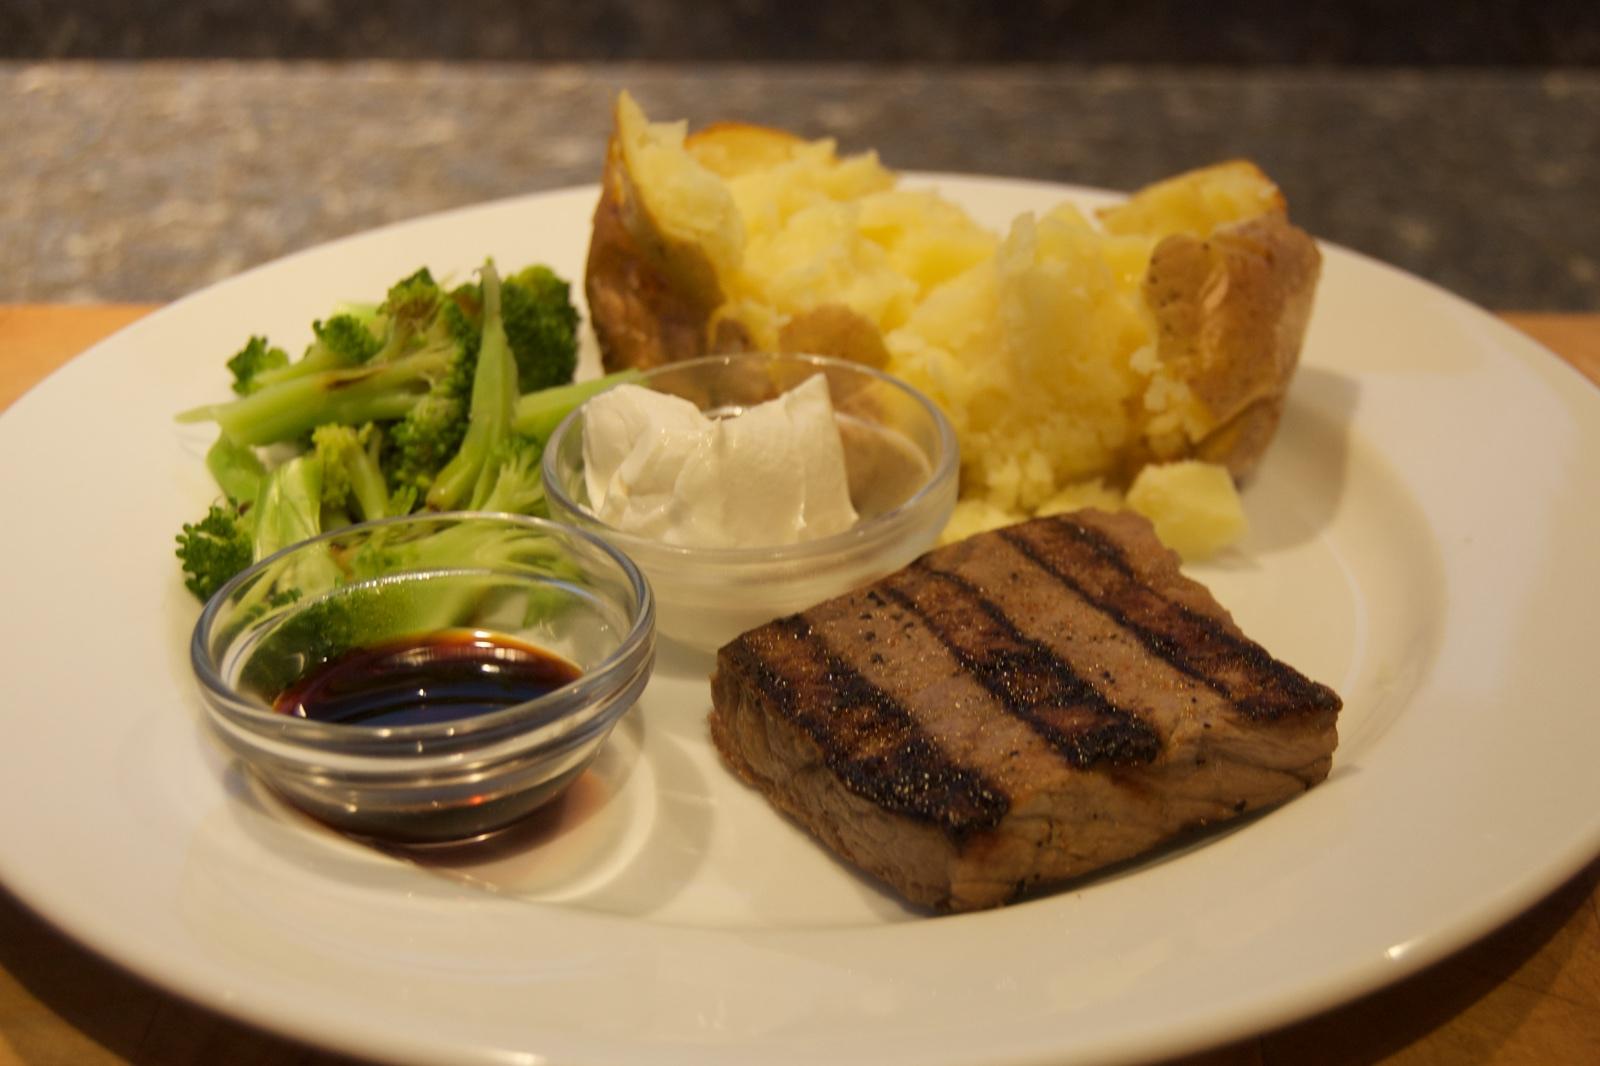 http://blog.rickk.com/food/2015/12/30/ate.2015.12.30.d.jpg